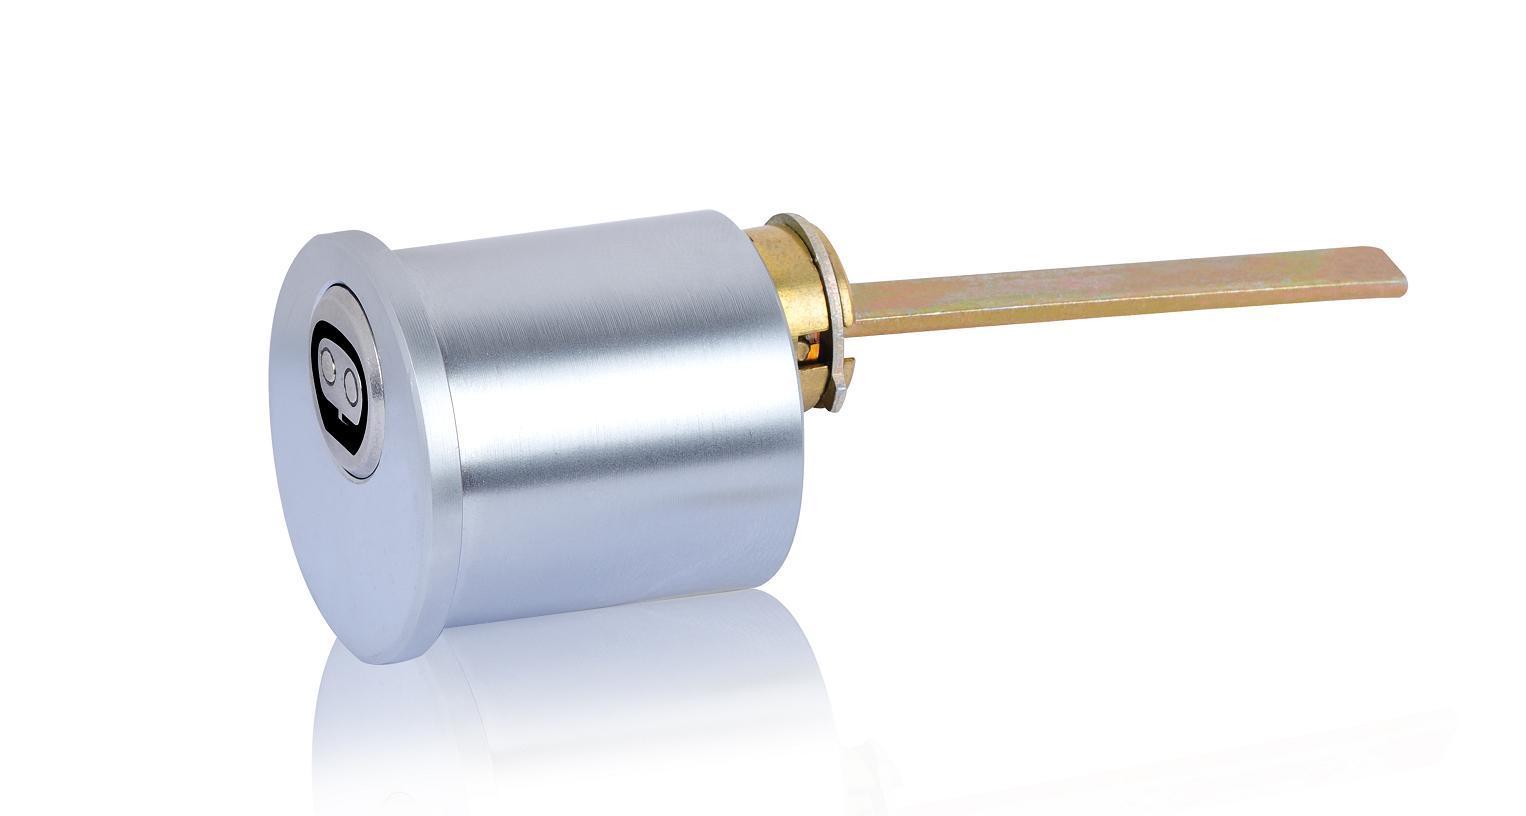 Rim Lock-Metratronic (smart) Lock